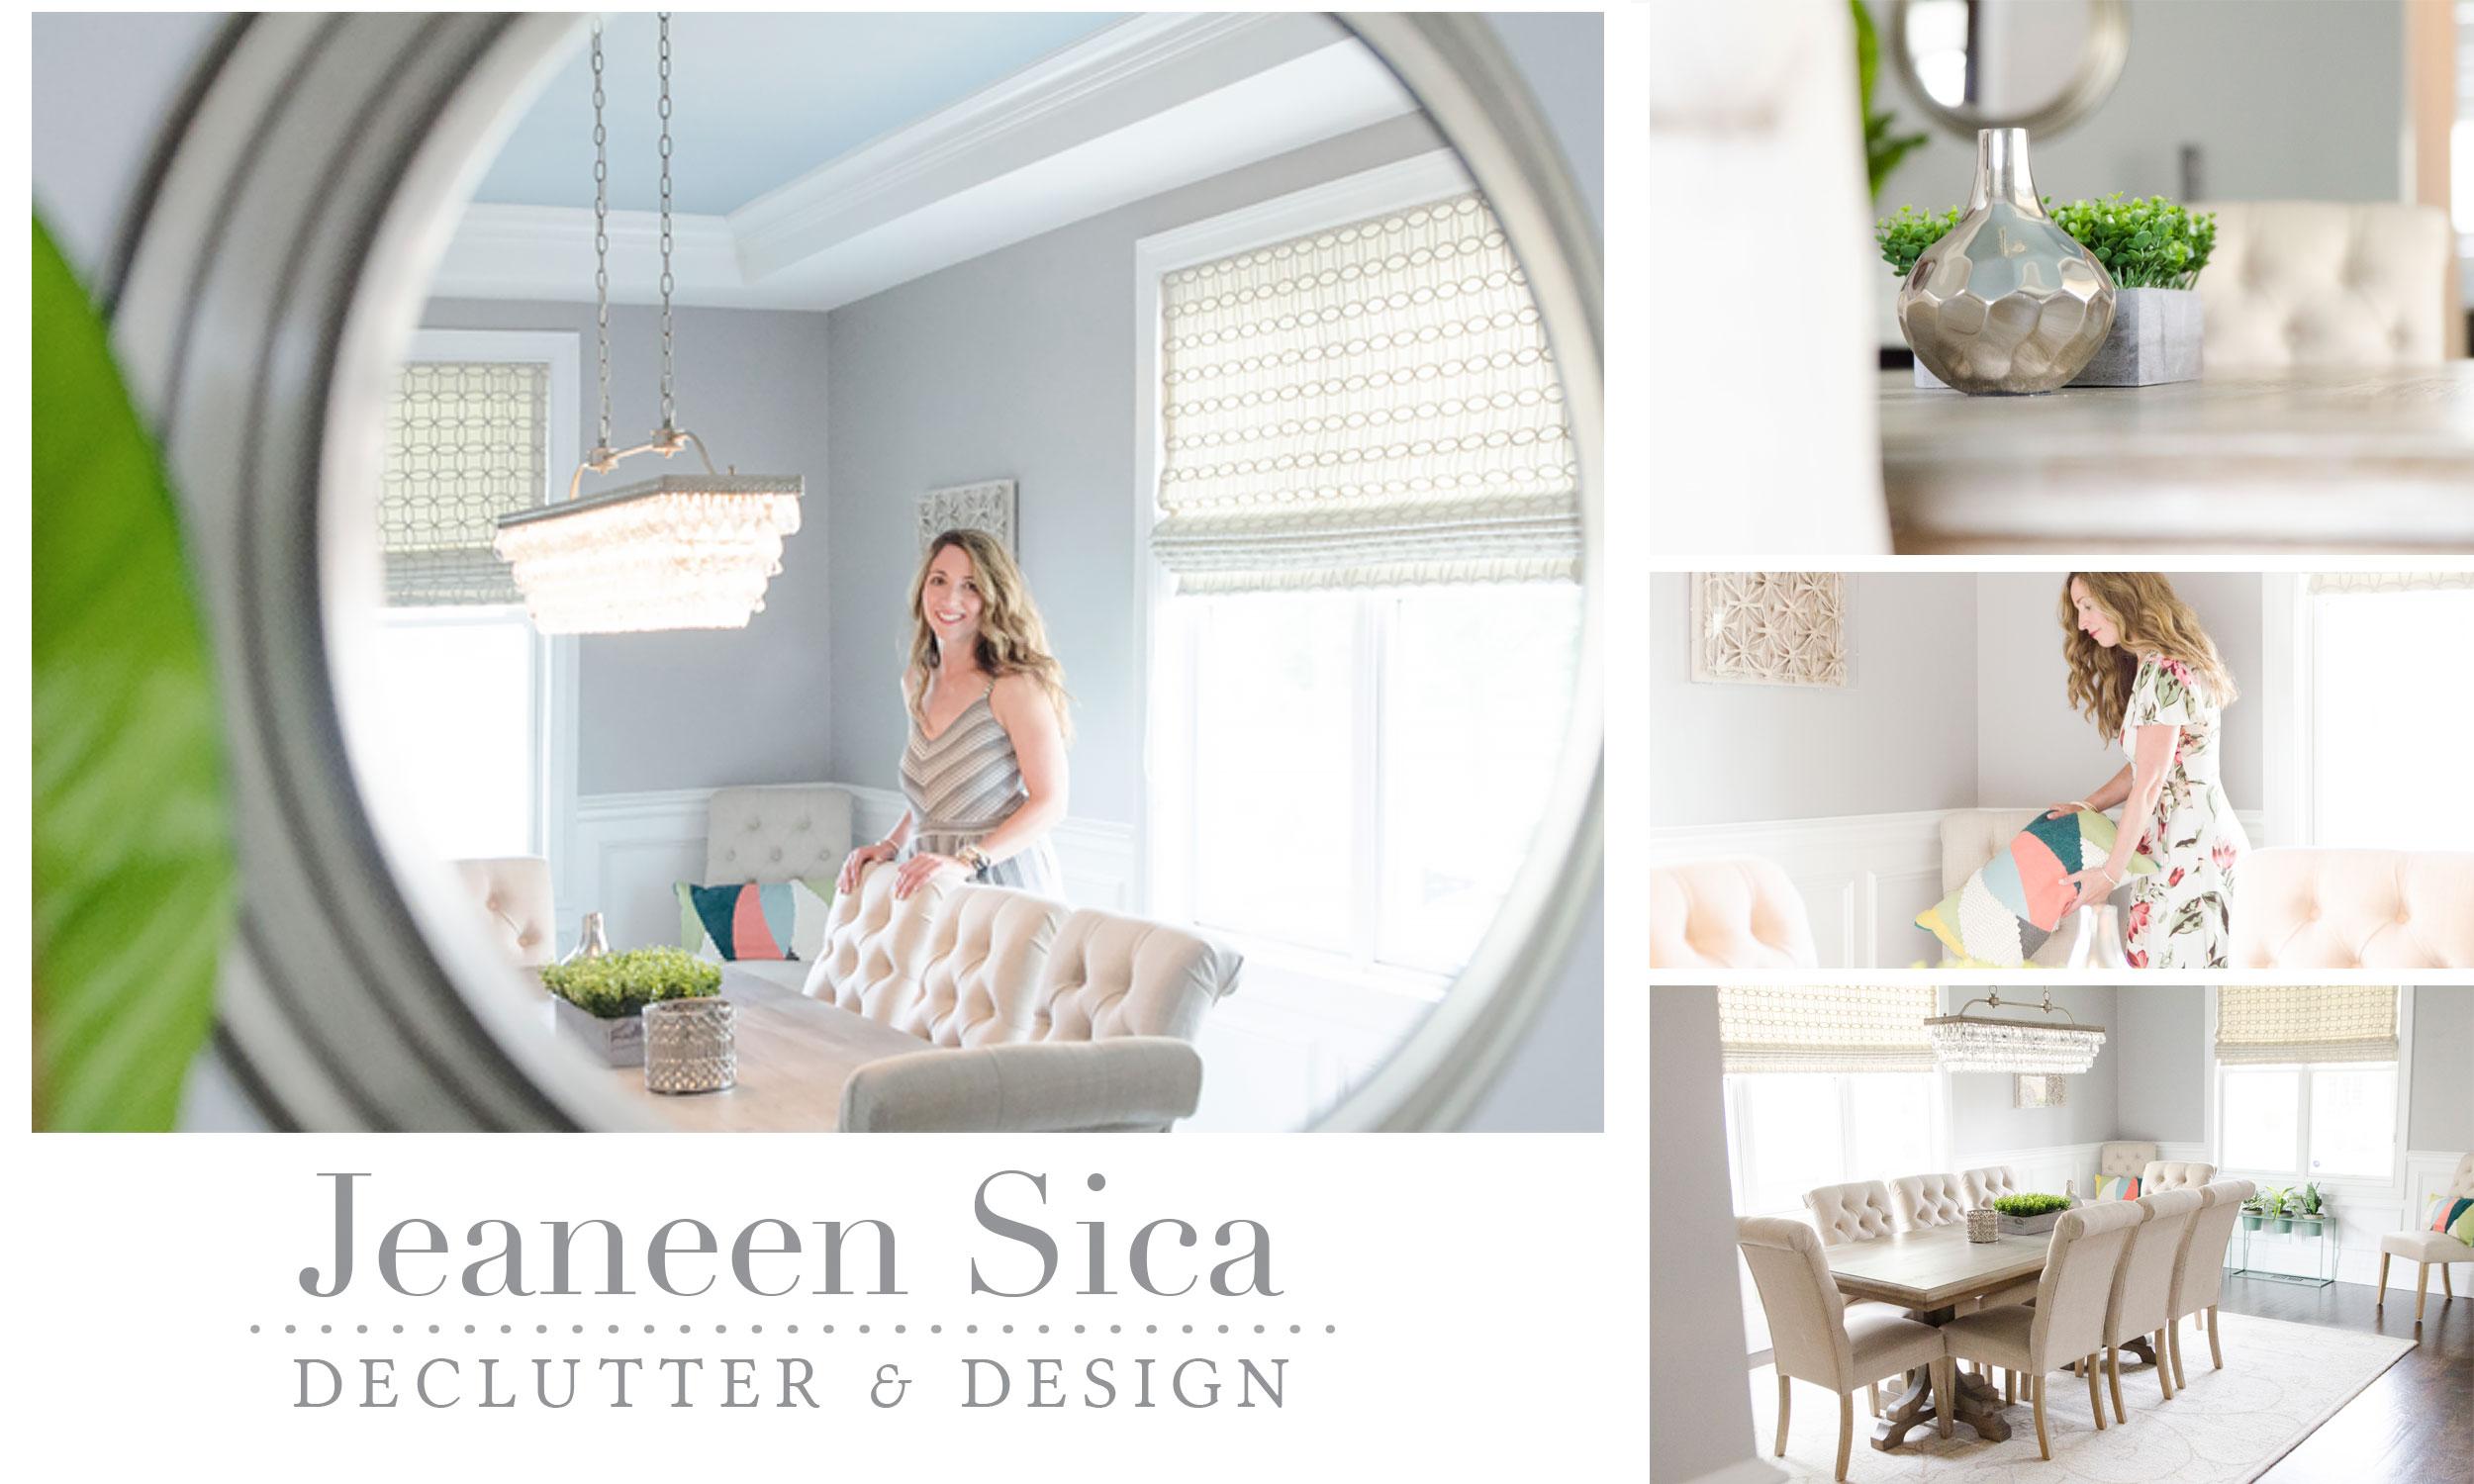 Jeaneen_Sica_Blog_Cover.jpg